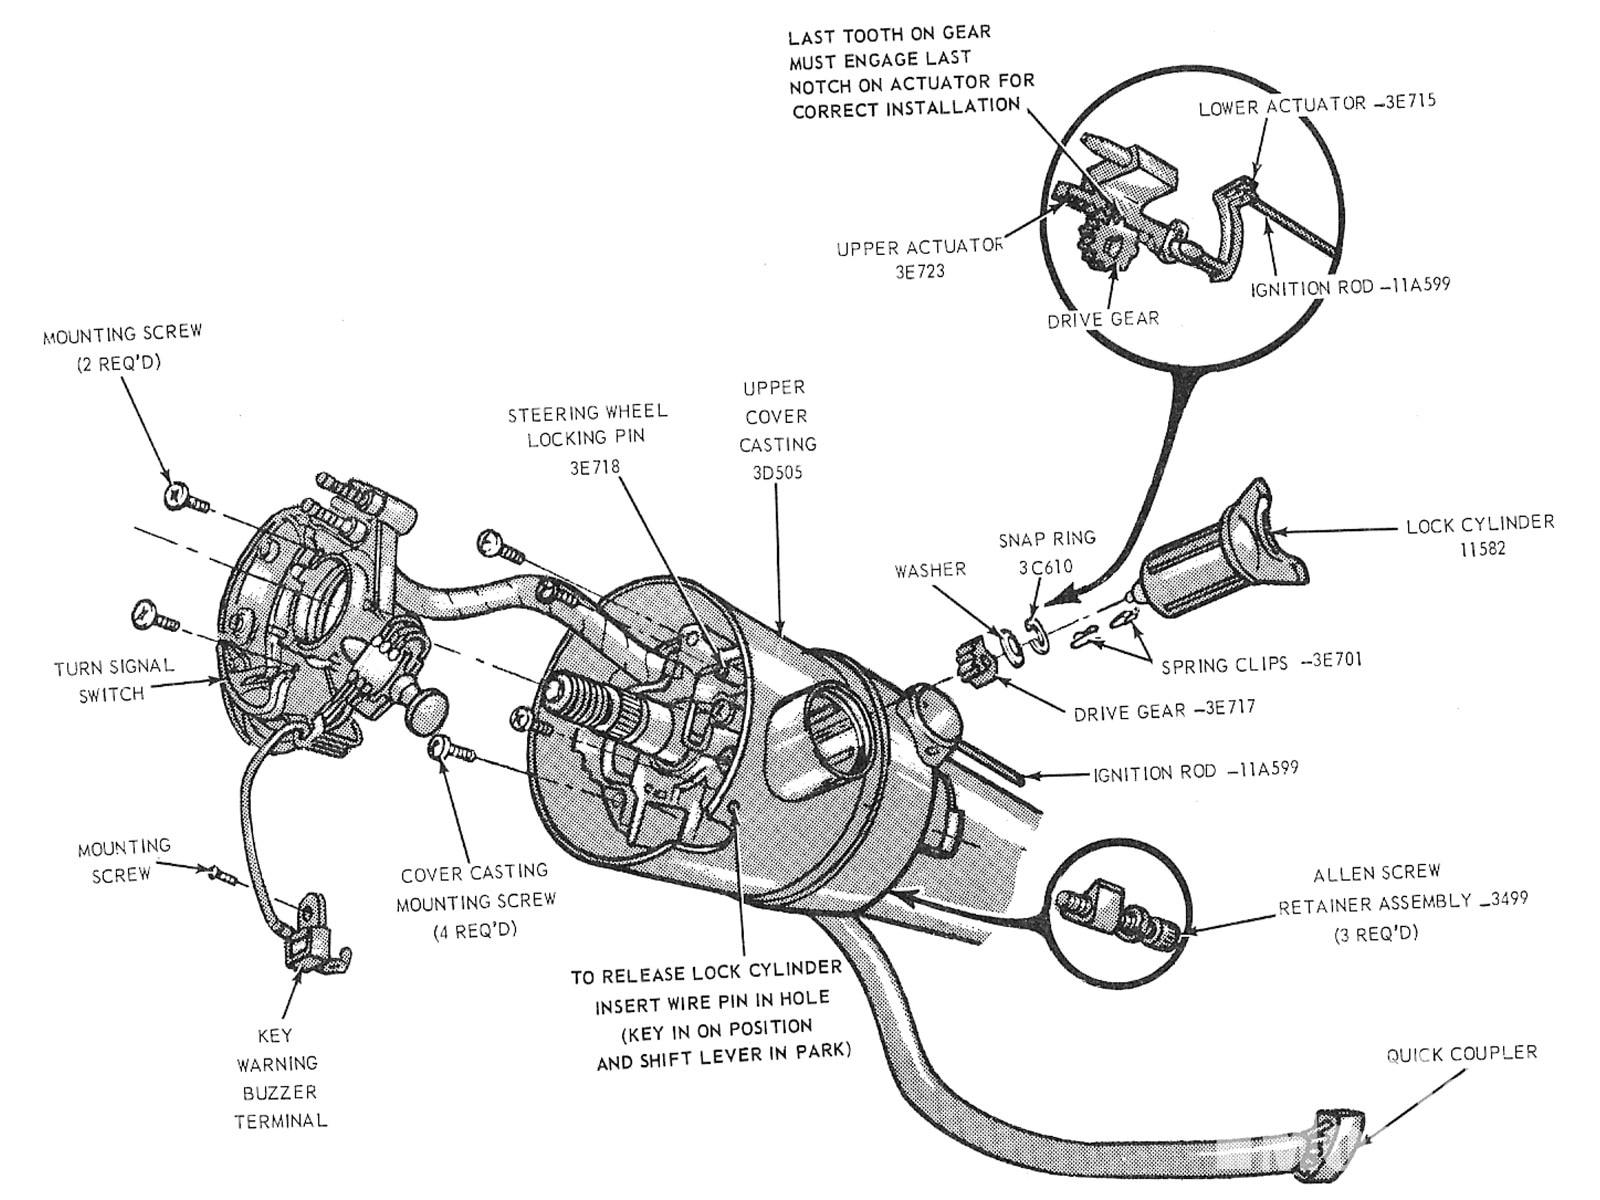 Mump 1012 04  Ford Mustang Locking Steering Columns